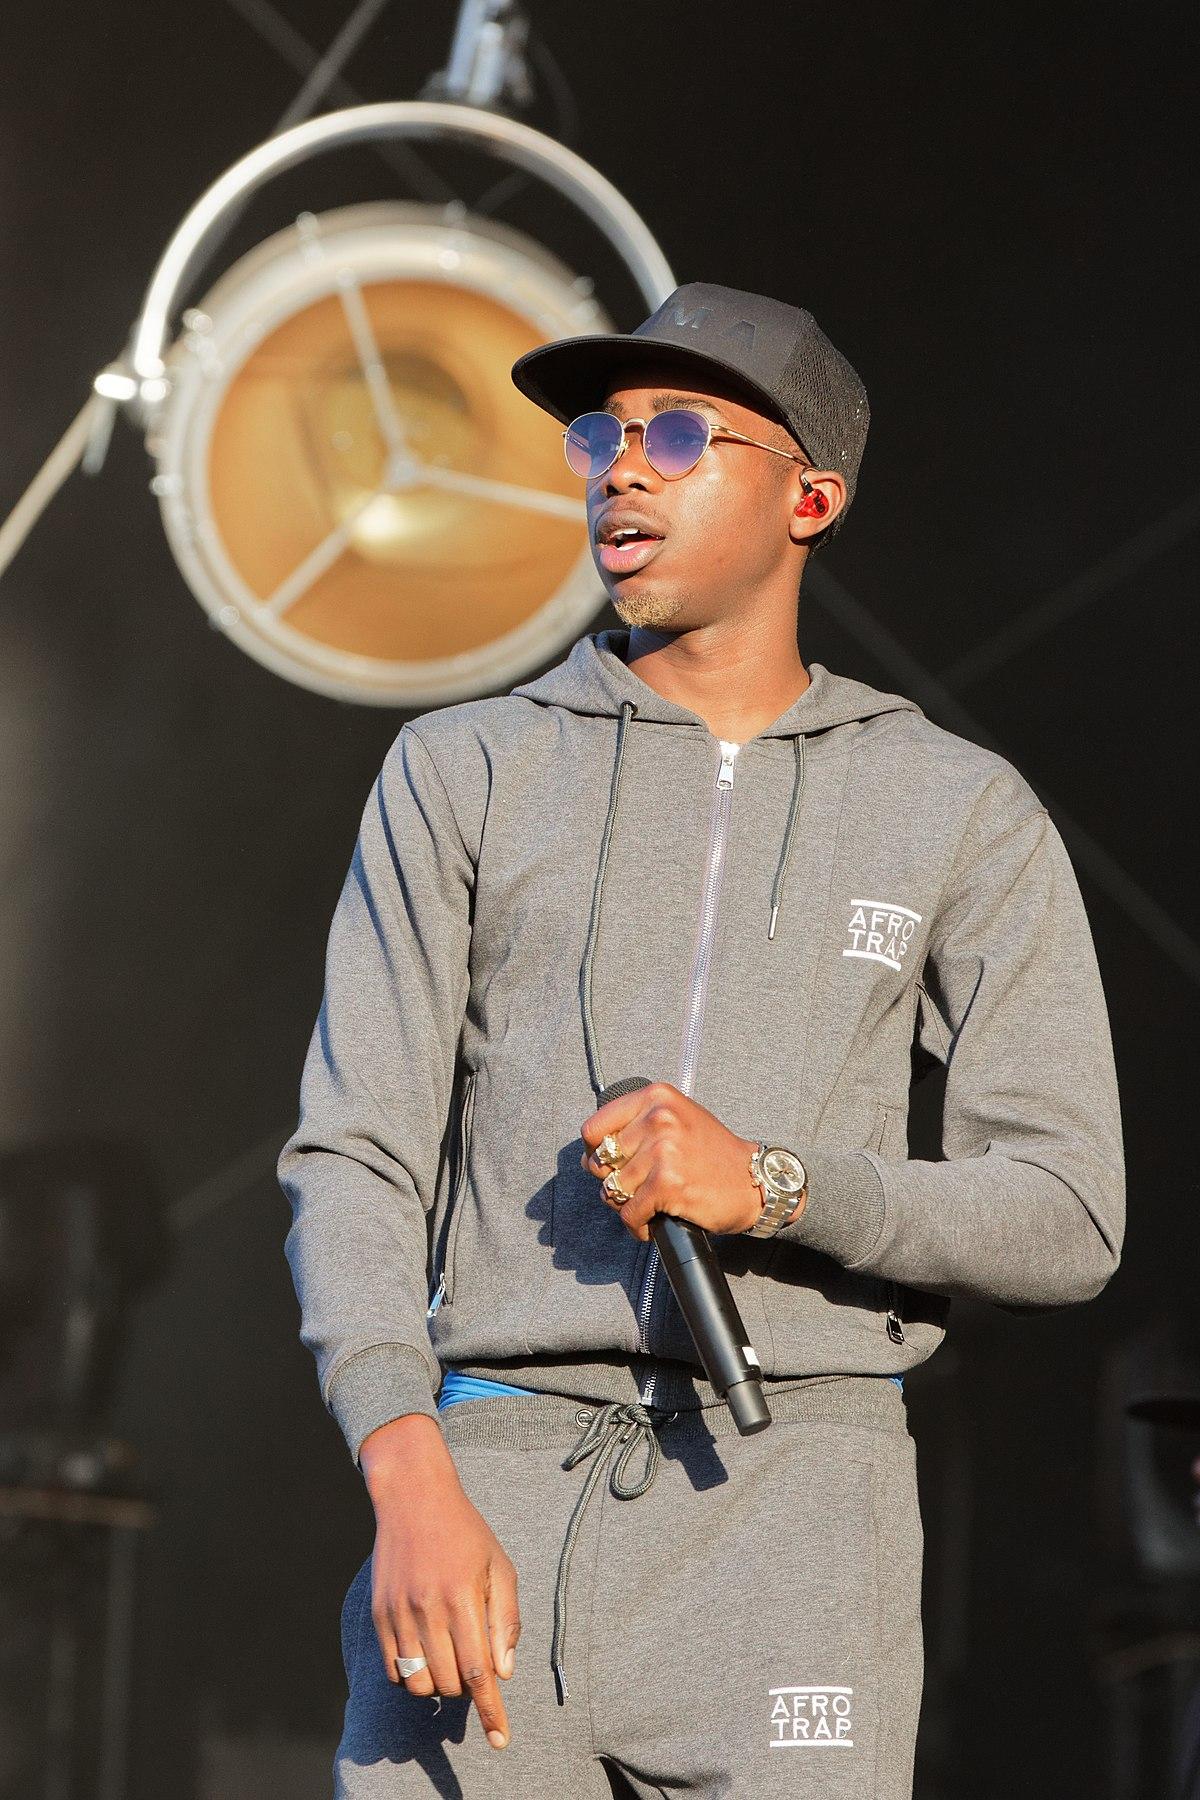 Mhd A Kele Nta : (rapper), Wikipedia